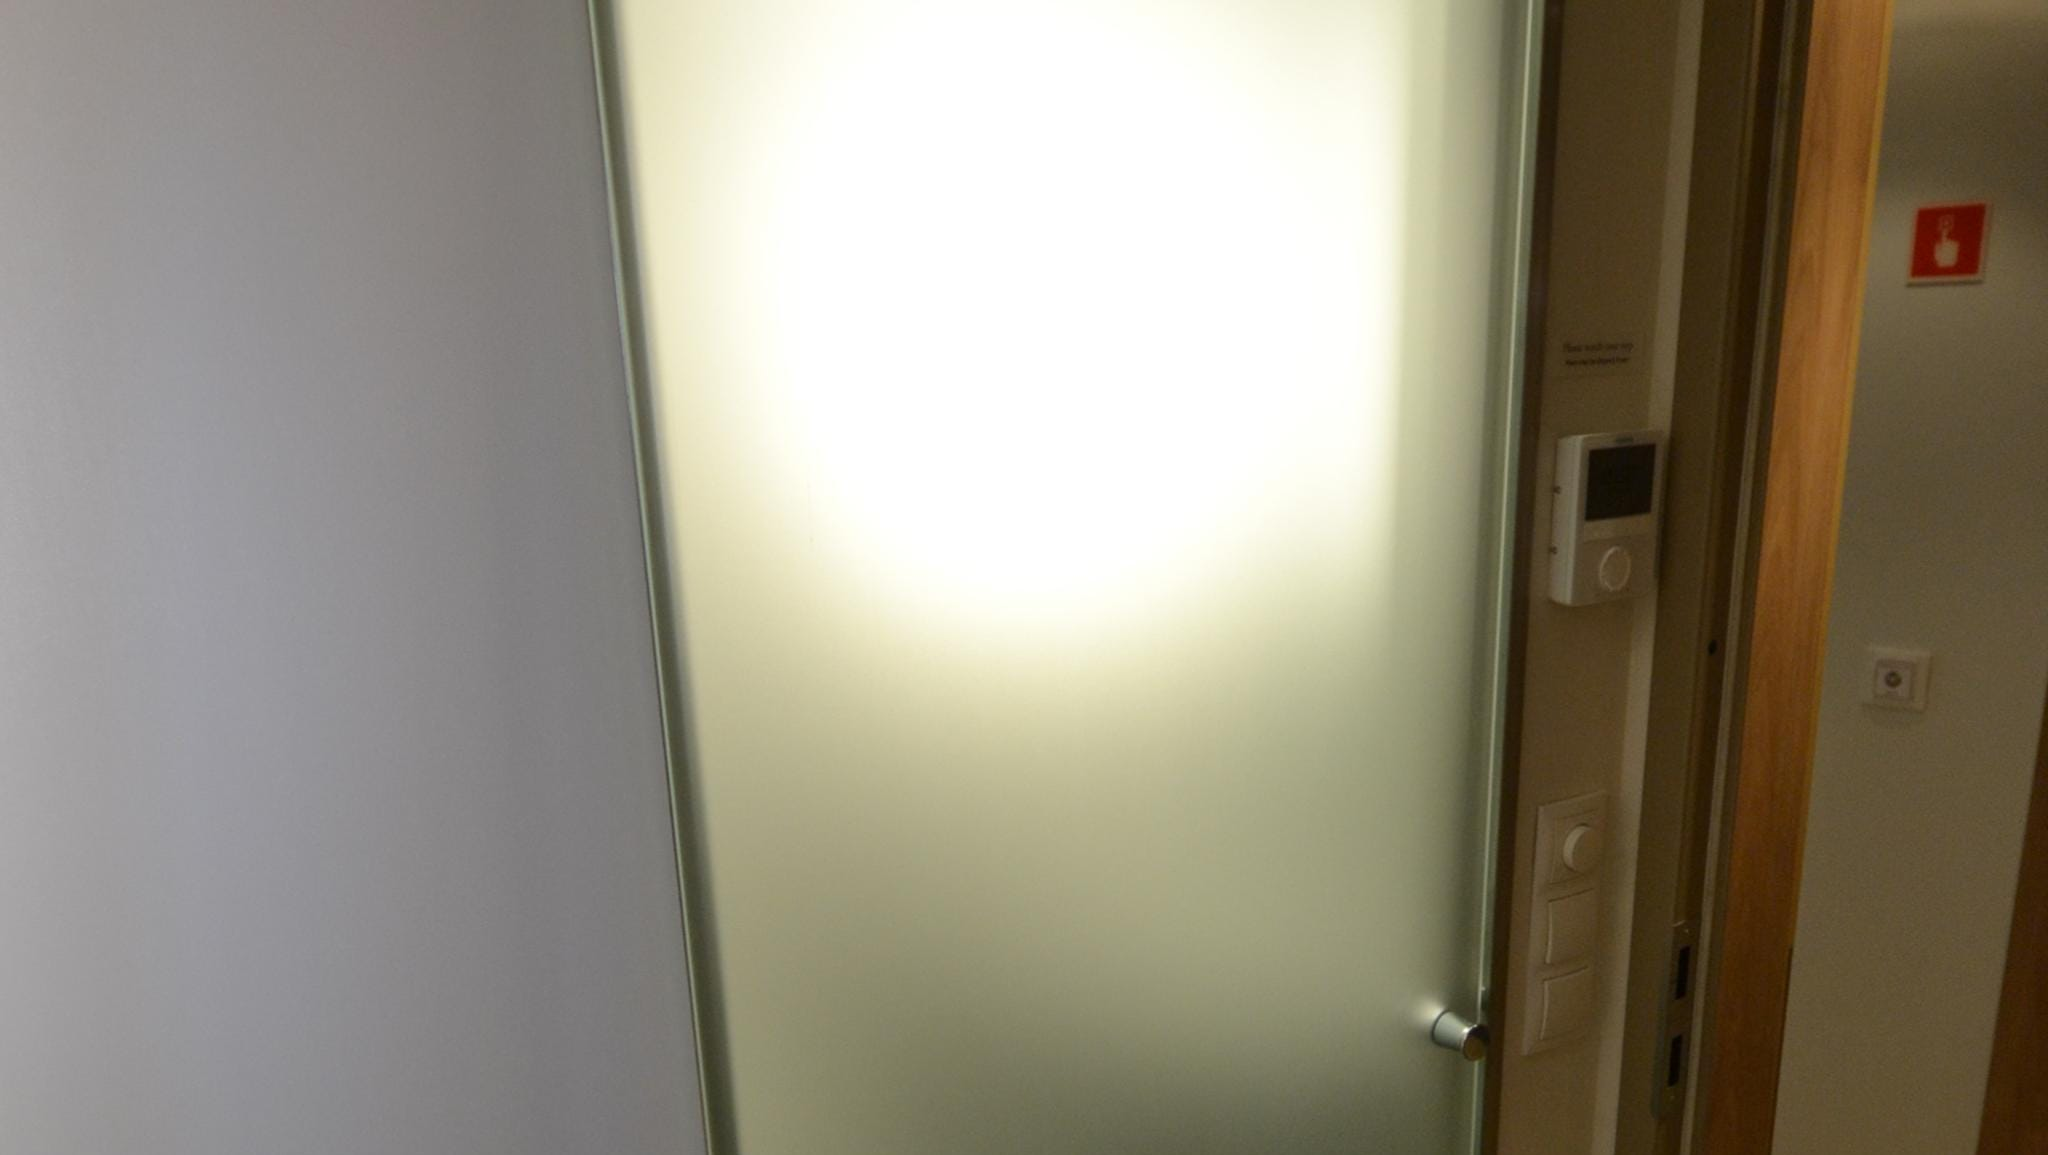 Bathrooms in Veranda Staterooms have translucent glass doors that slide shut.